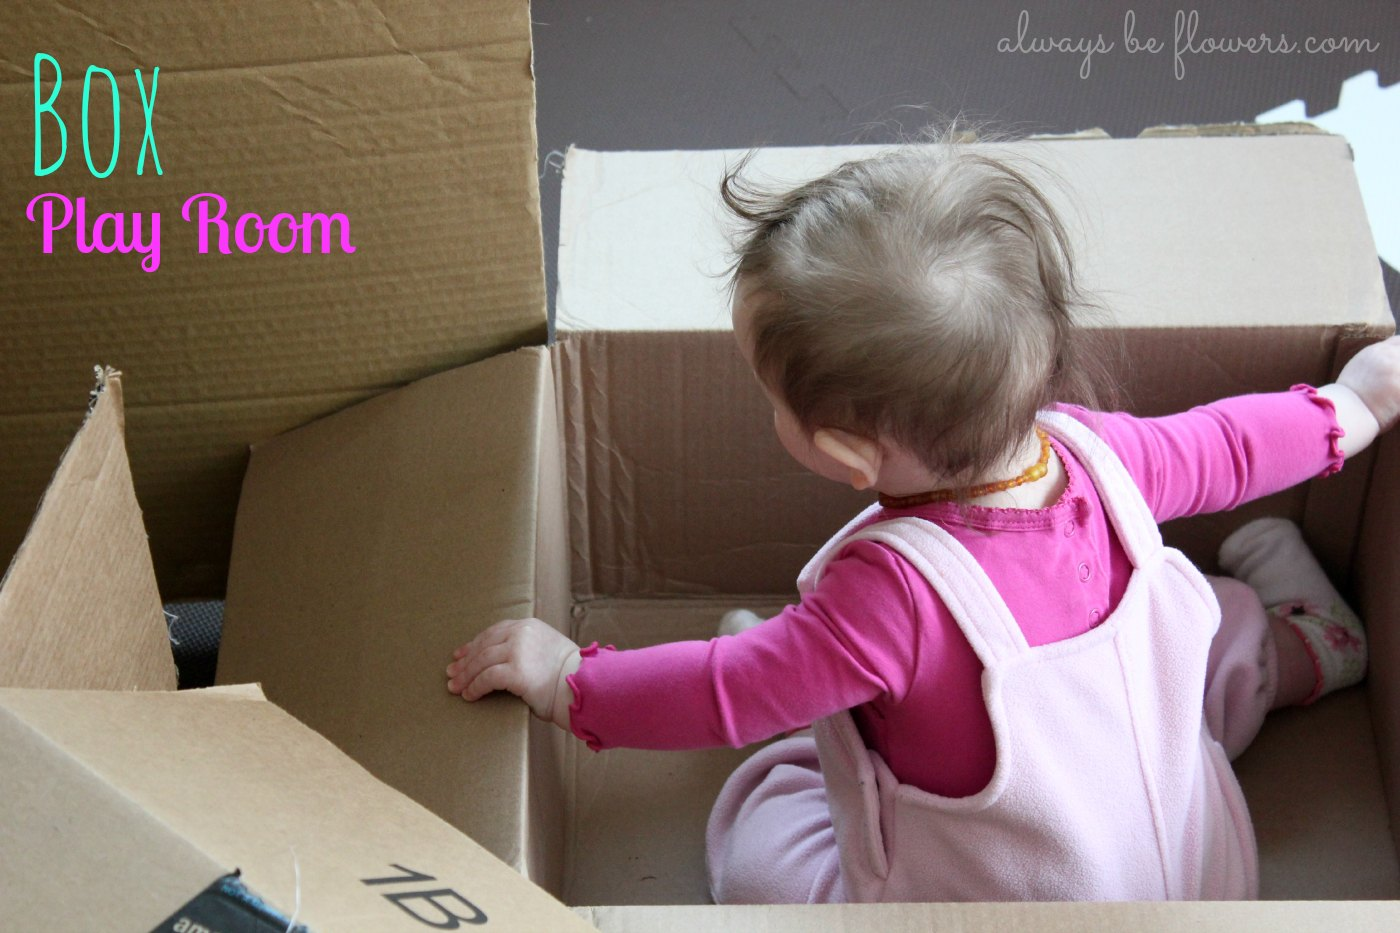 2014-box-play-room-1.jpg